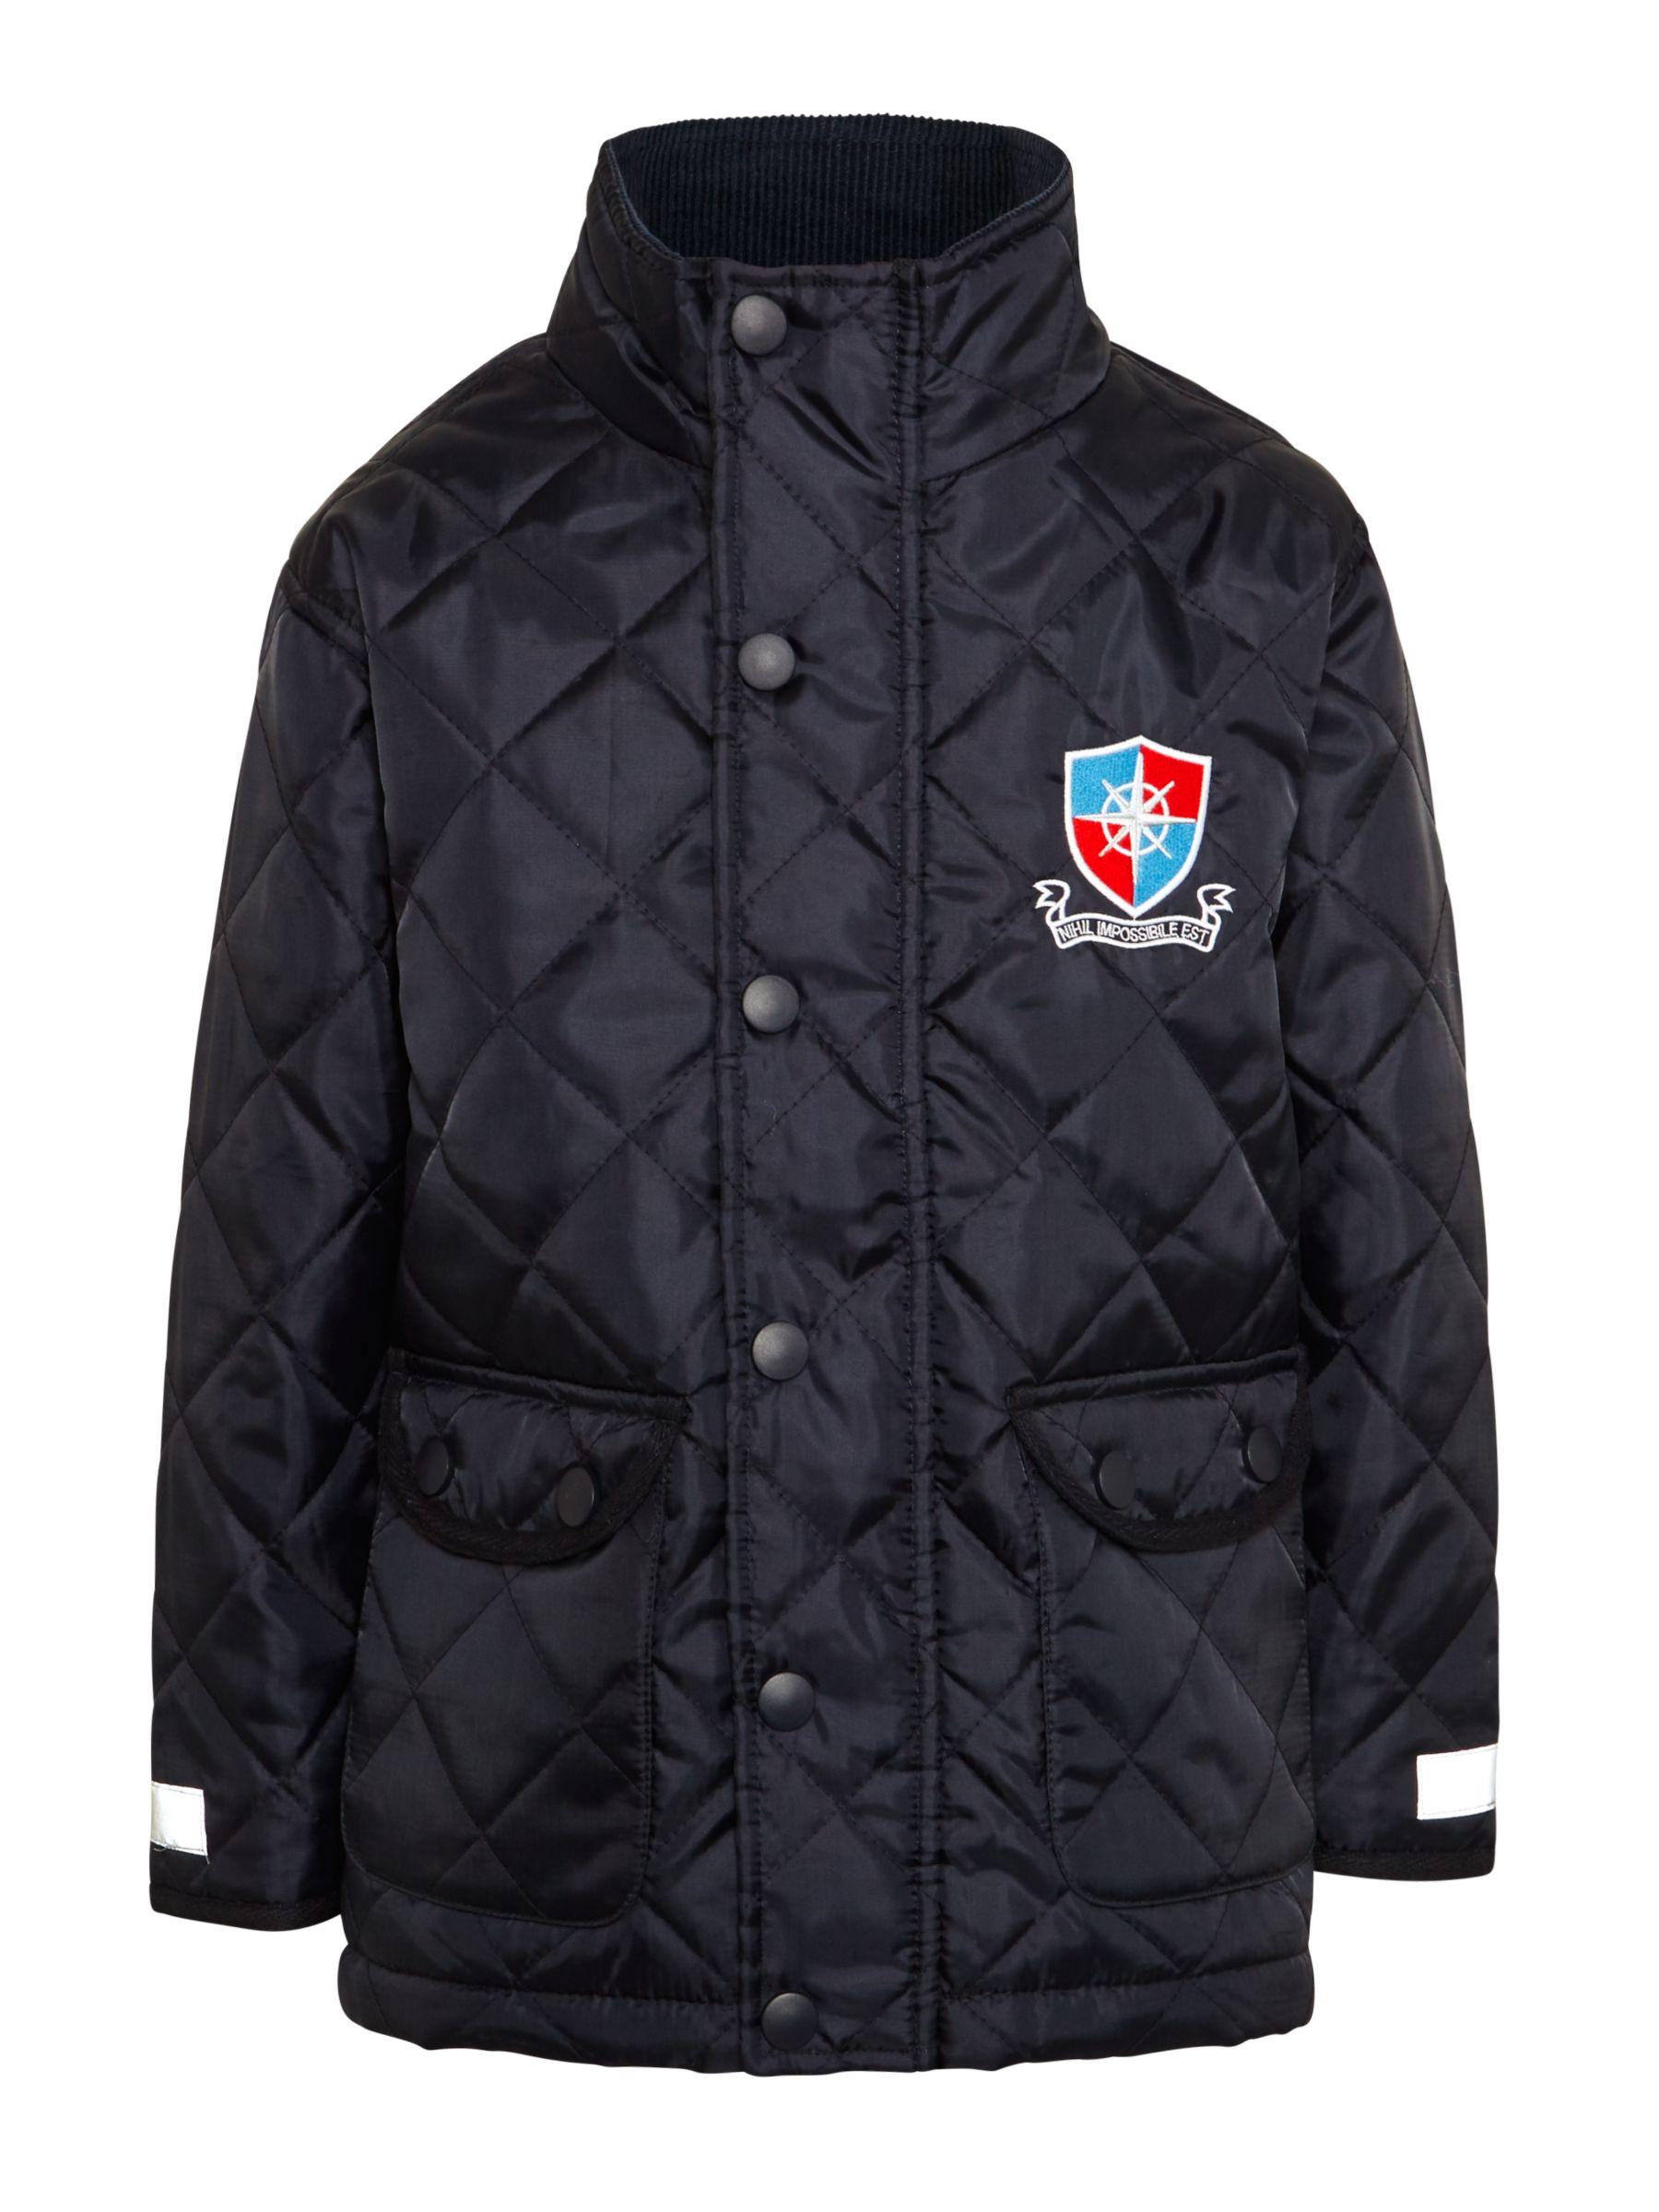 Unbranded Fairley House School Coat